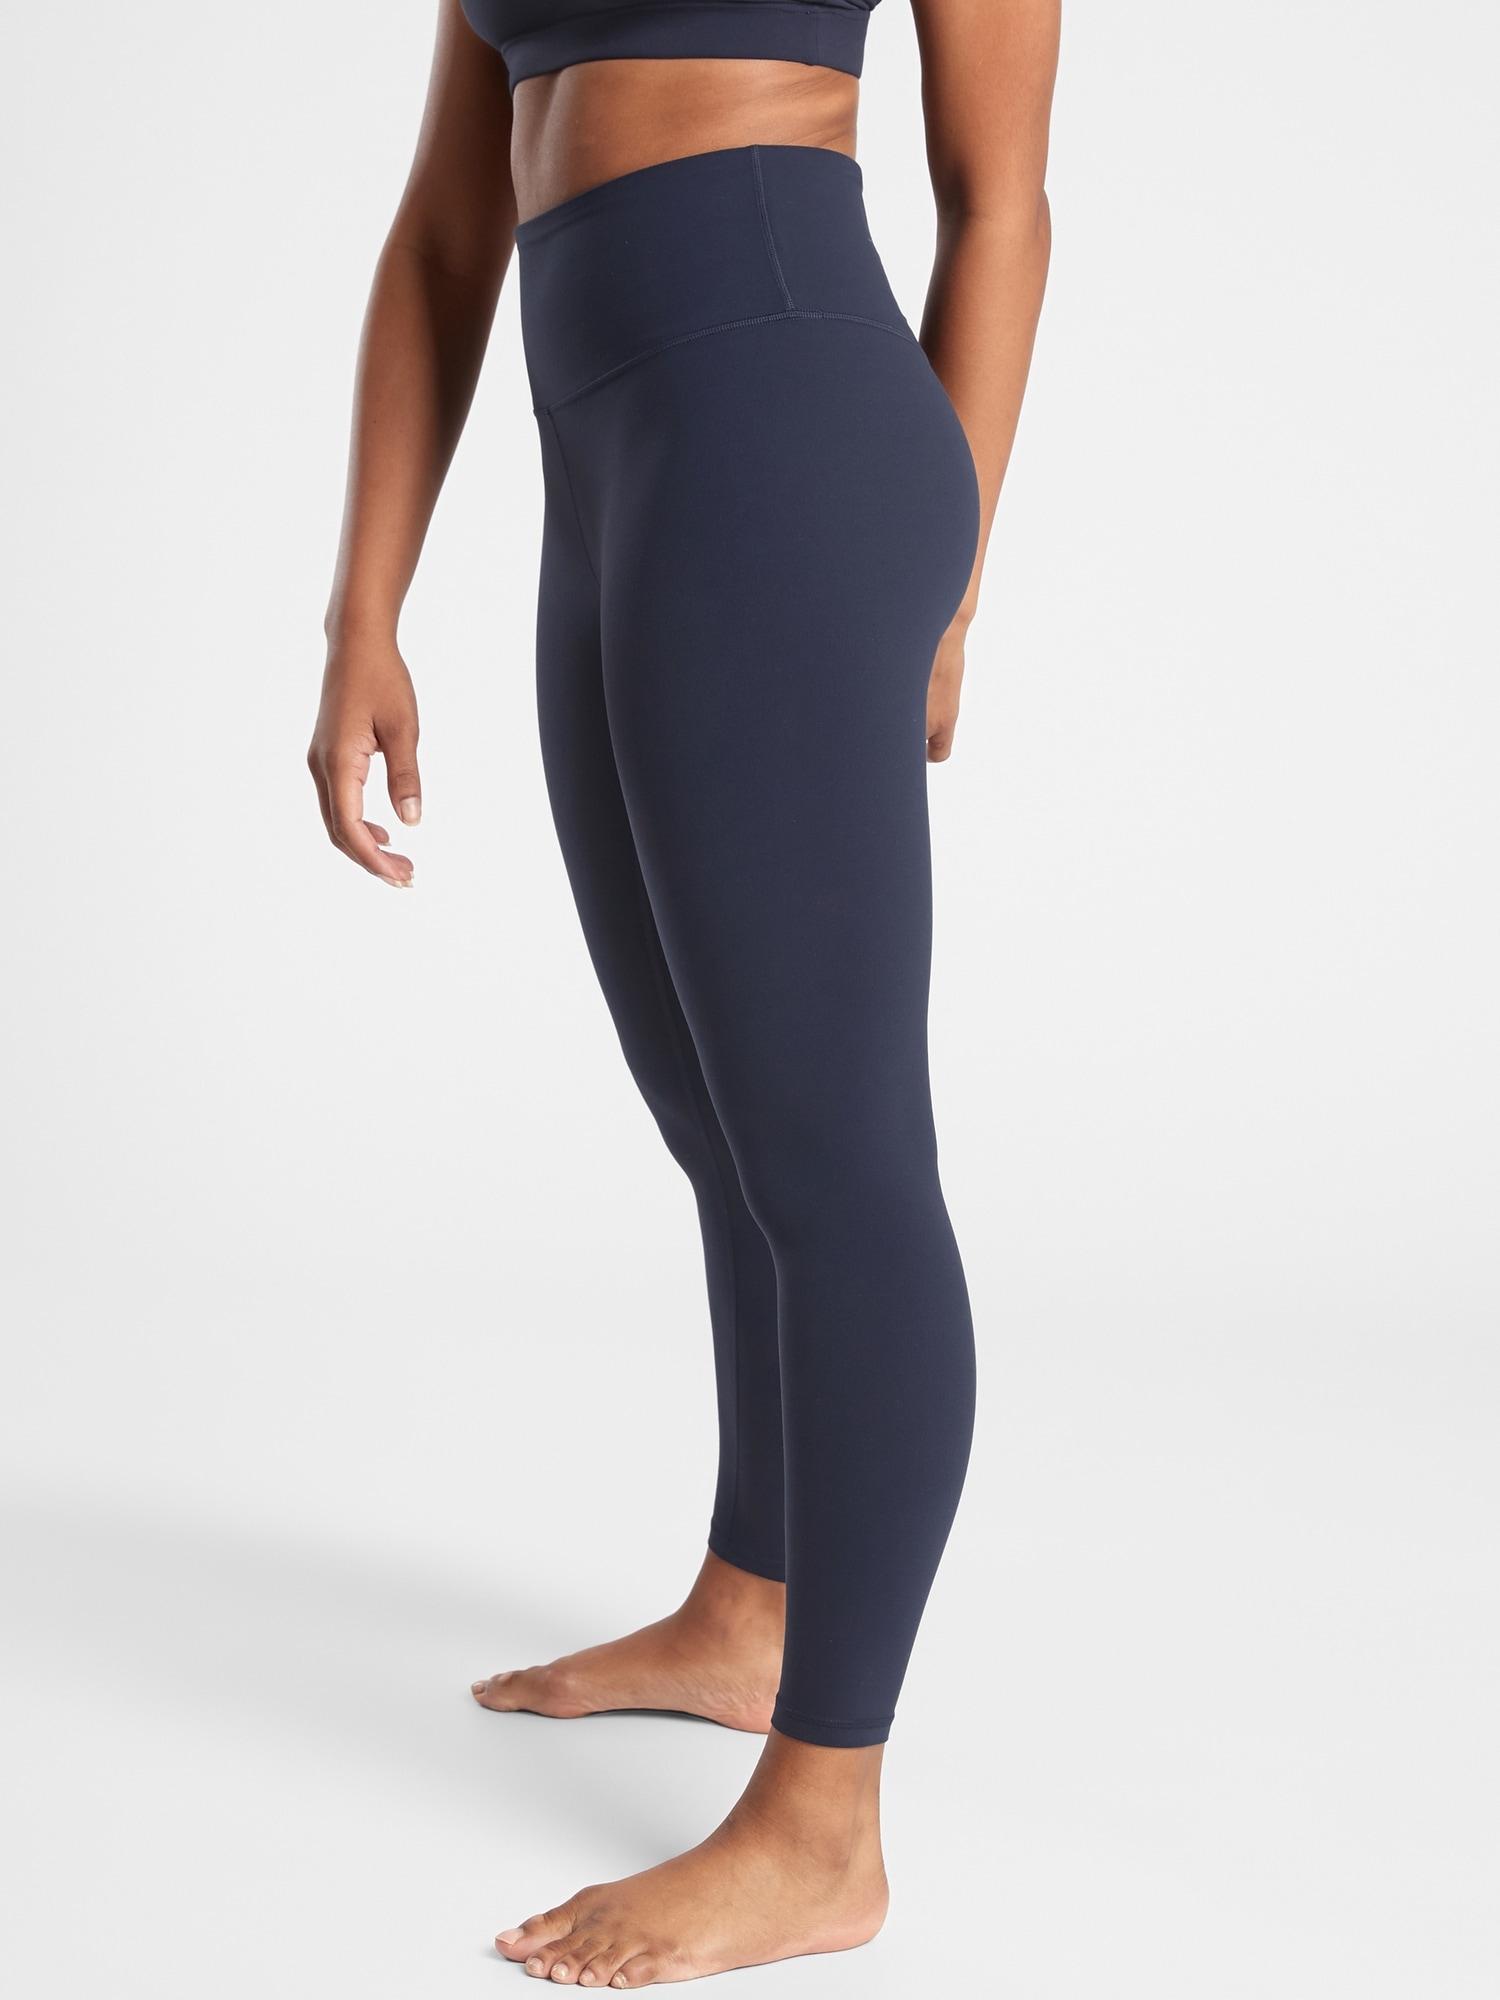 ATHLETA L Elation Ultra High Rise Shimmer Tight Leggings LARGE Black Shiny Yoga